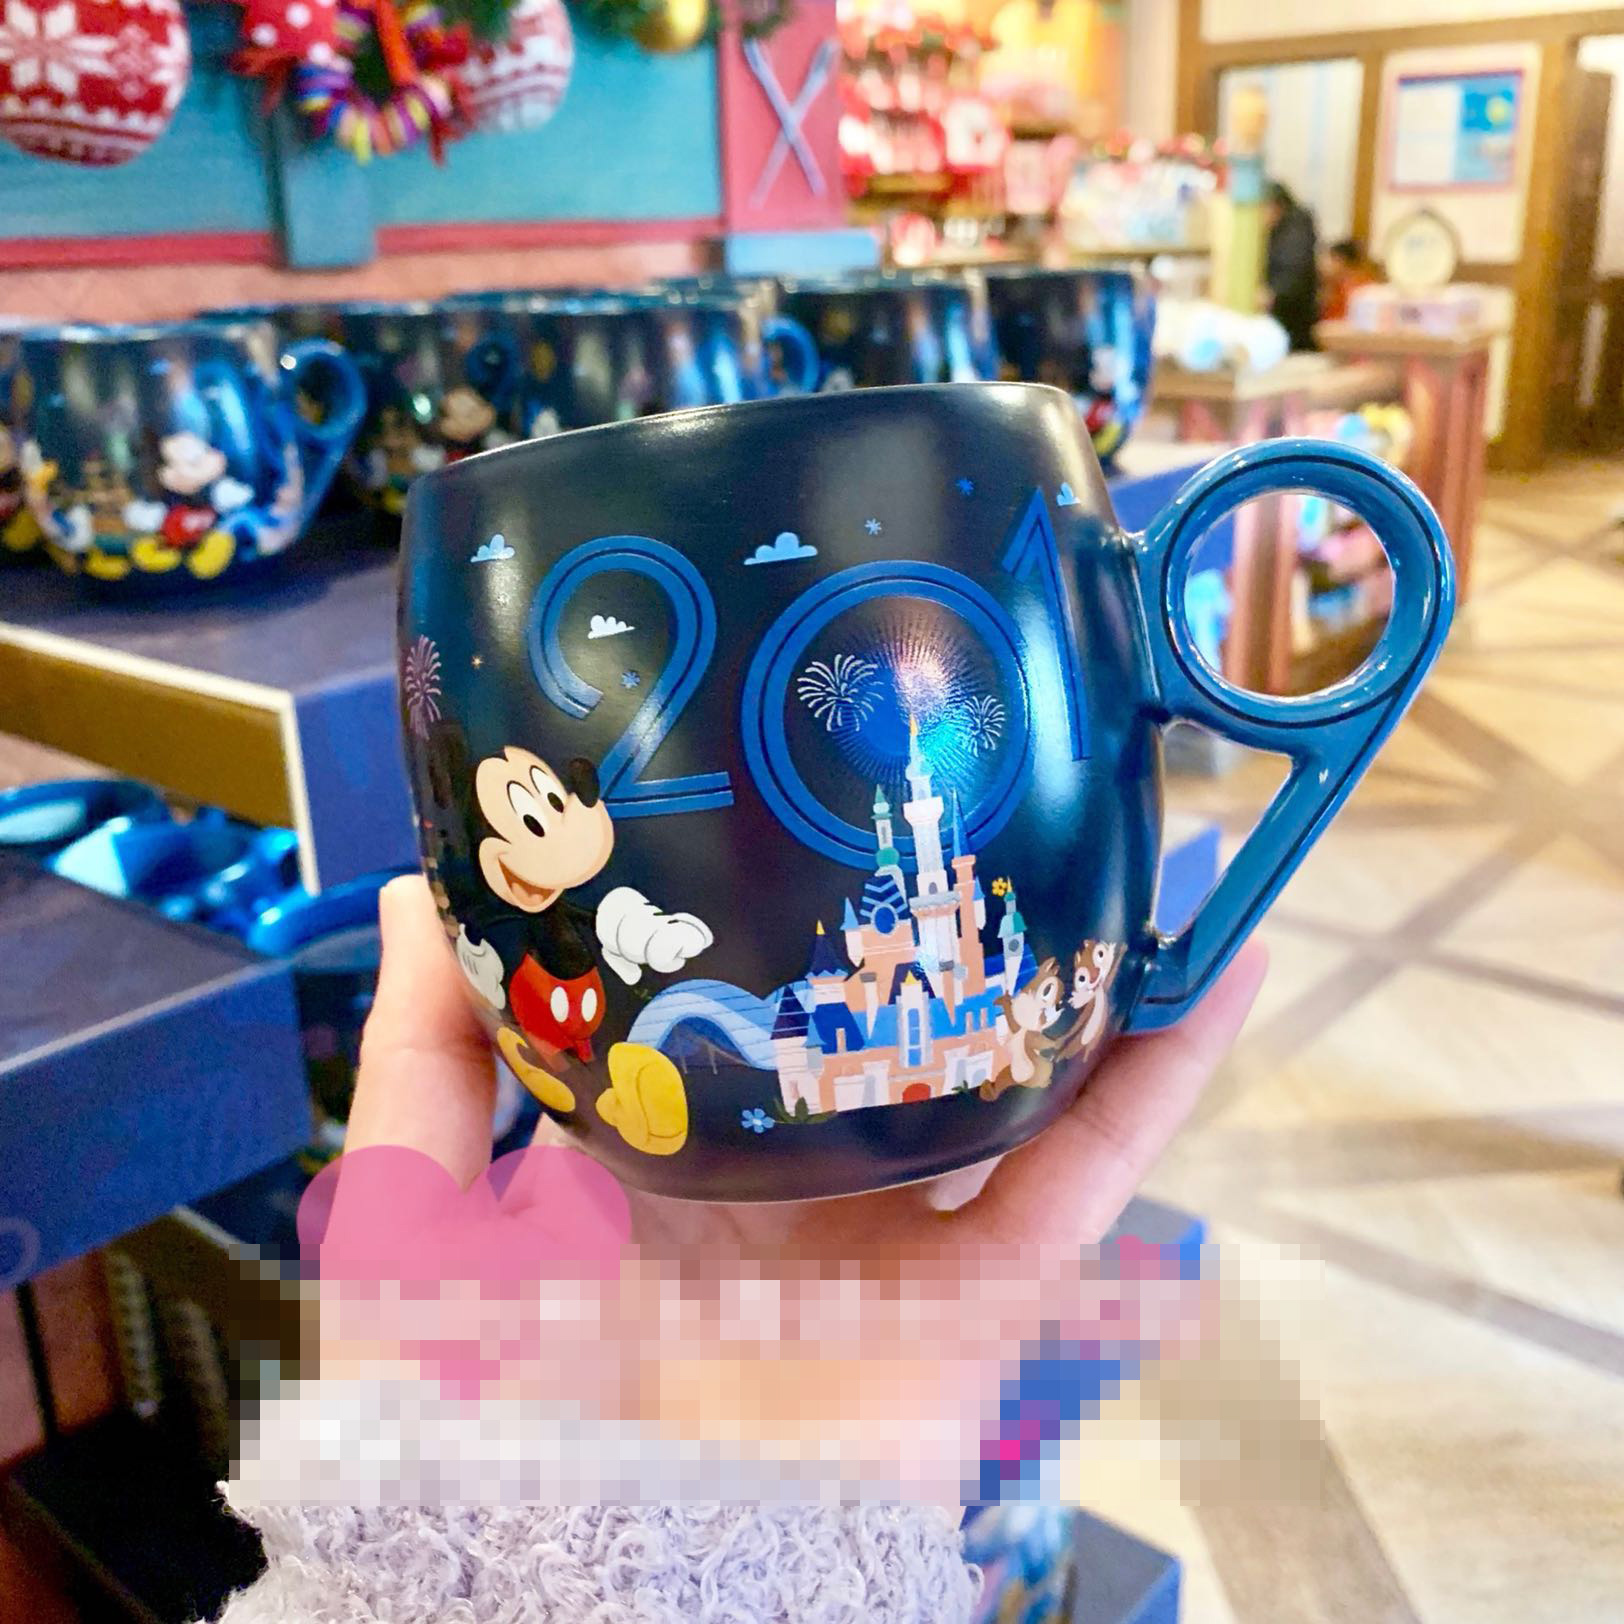 Disney Baby Ceramic Cup 2019 Kids Child Women Drinking 3d Cartoon Home Water Sweet Baby Bottle